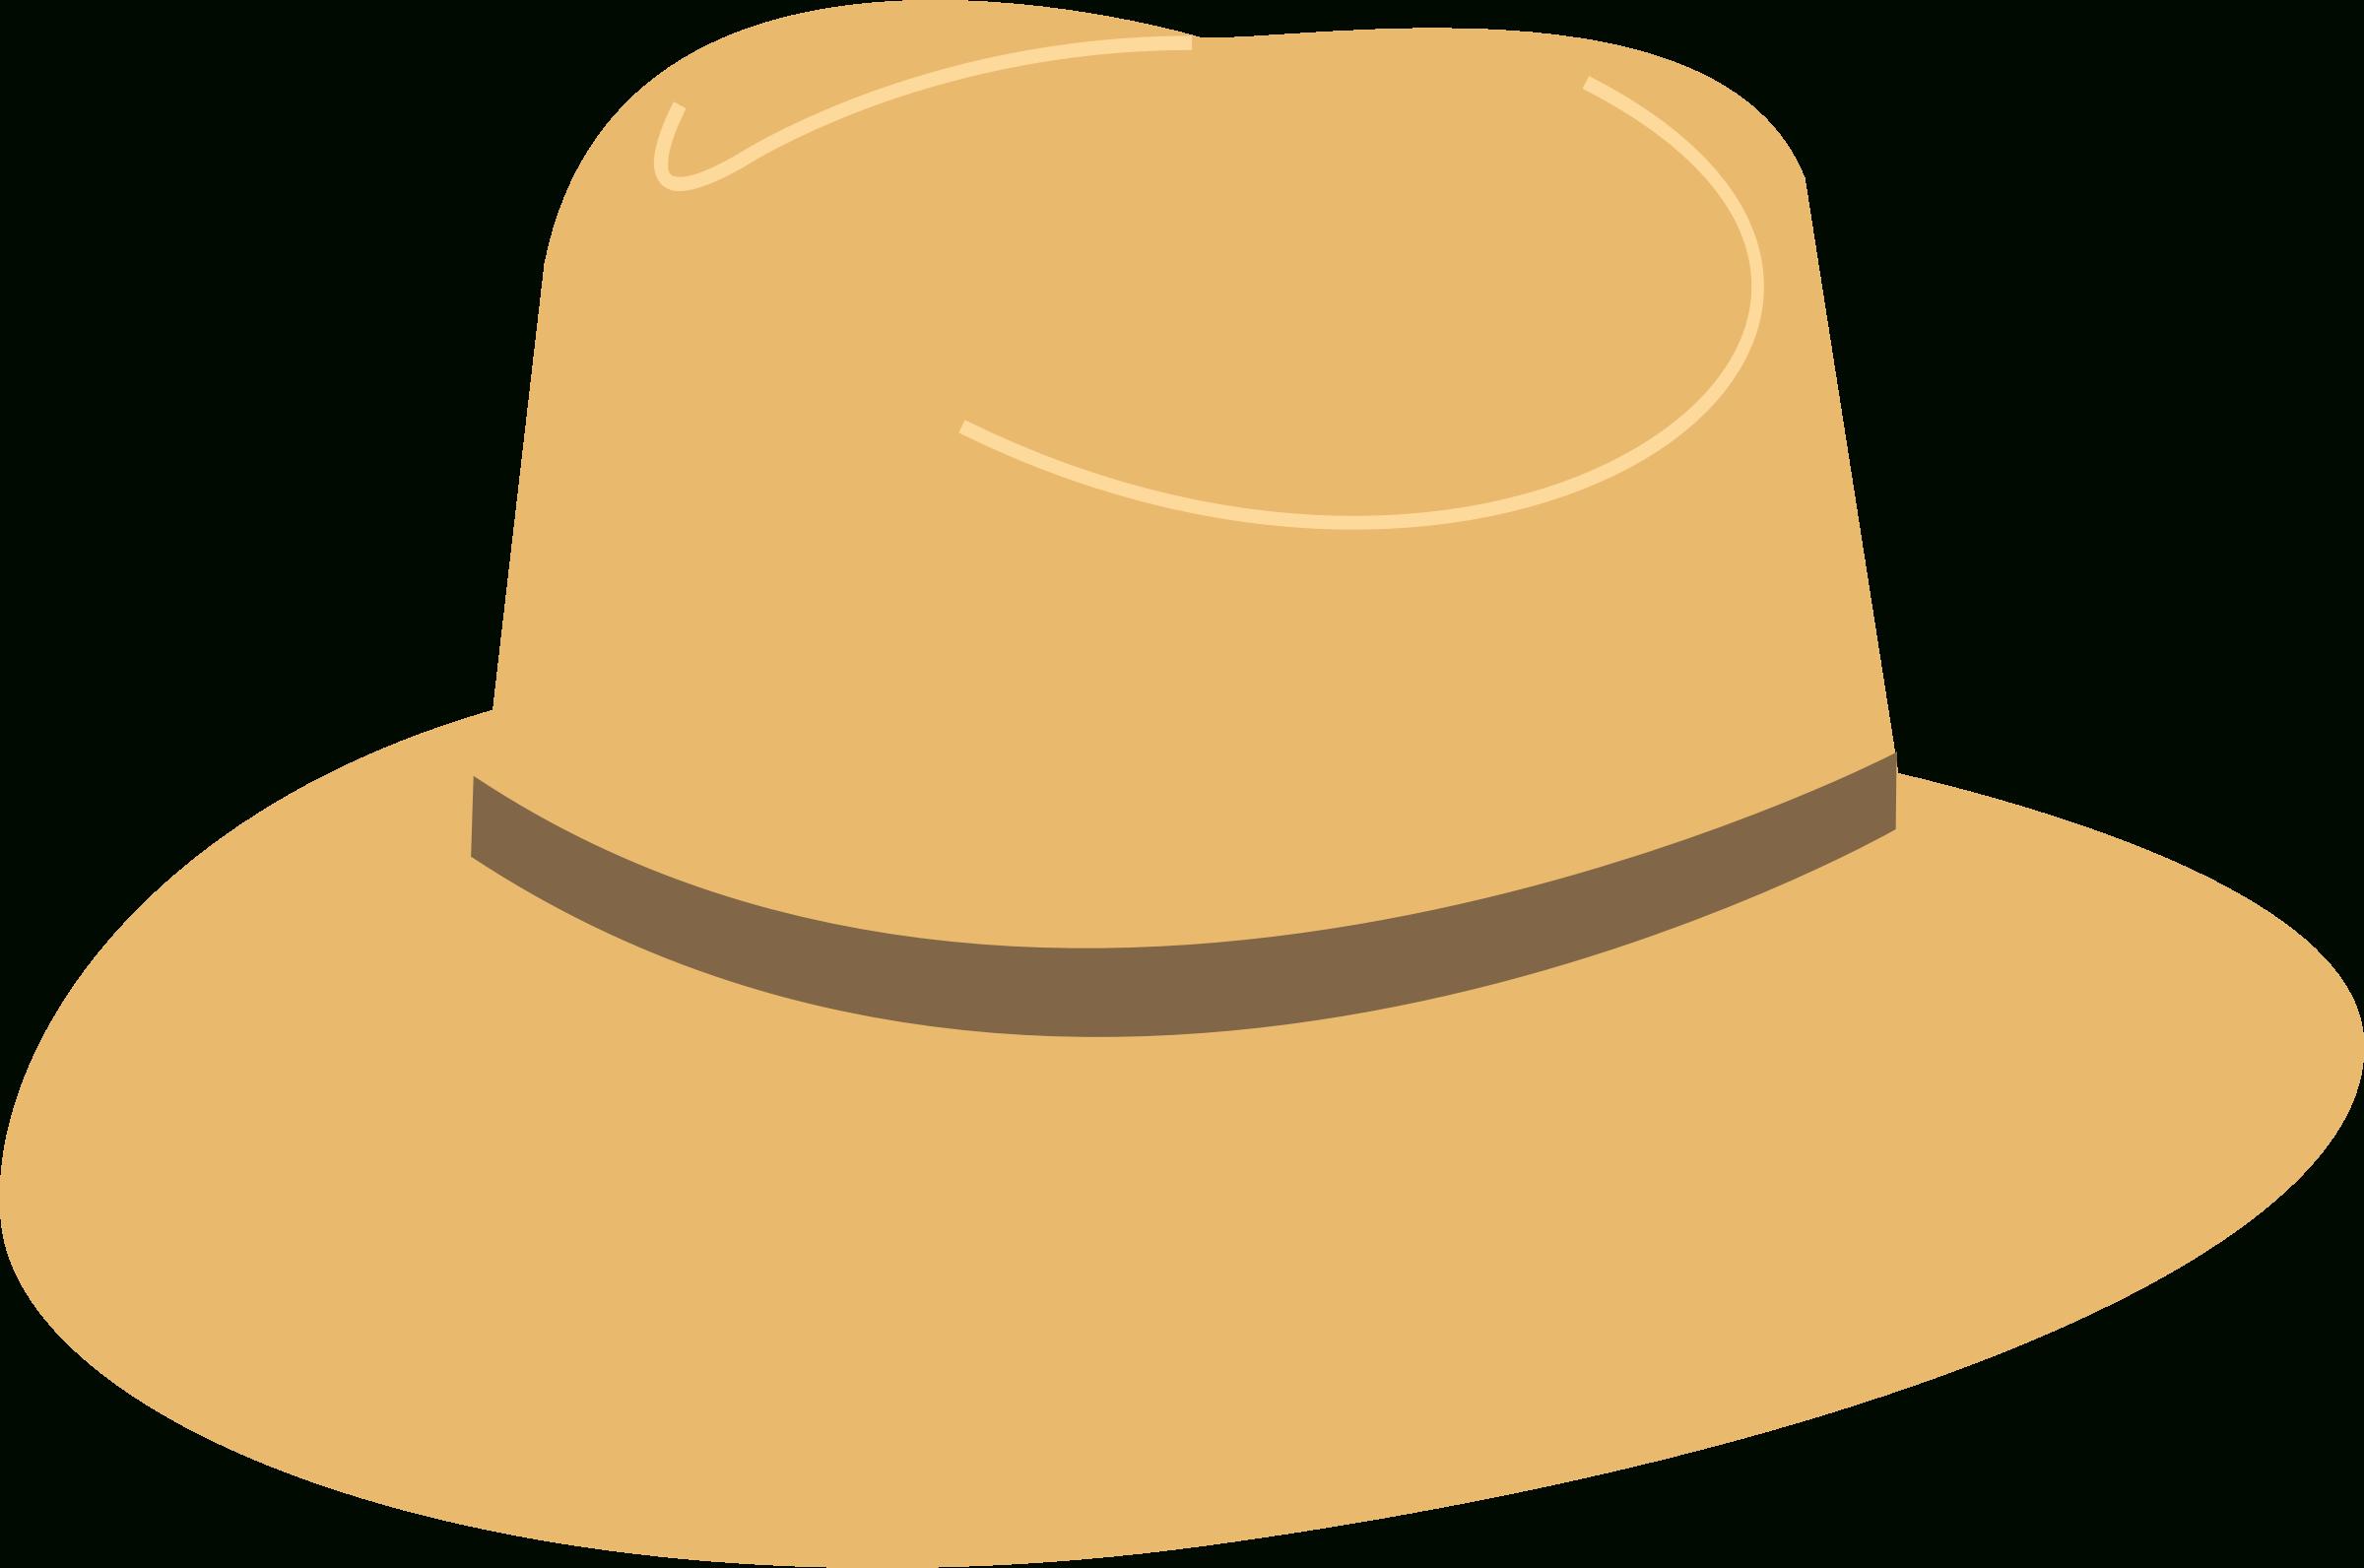 Cowboy Hat Clipart To Free Download Free Clip Art Clip Art Hats